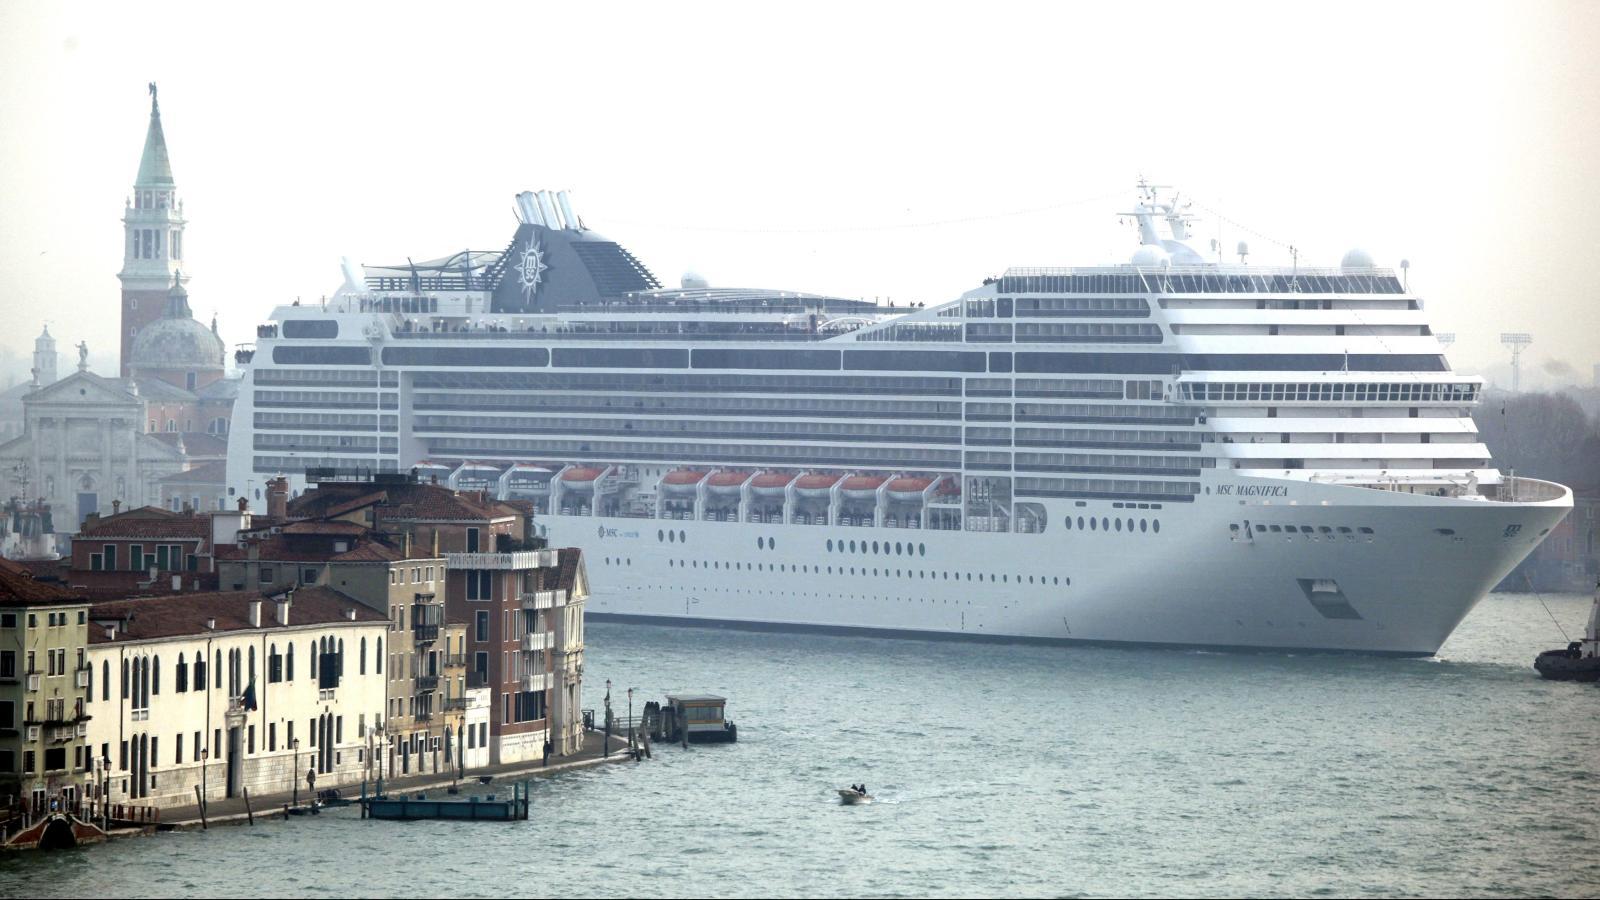 November 2017 saw a ban on huge cruise ships in Venice's lagoon.